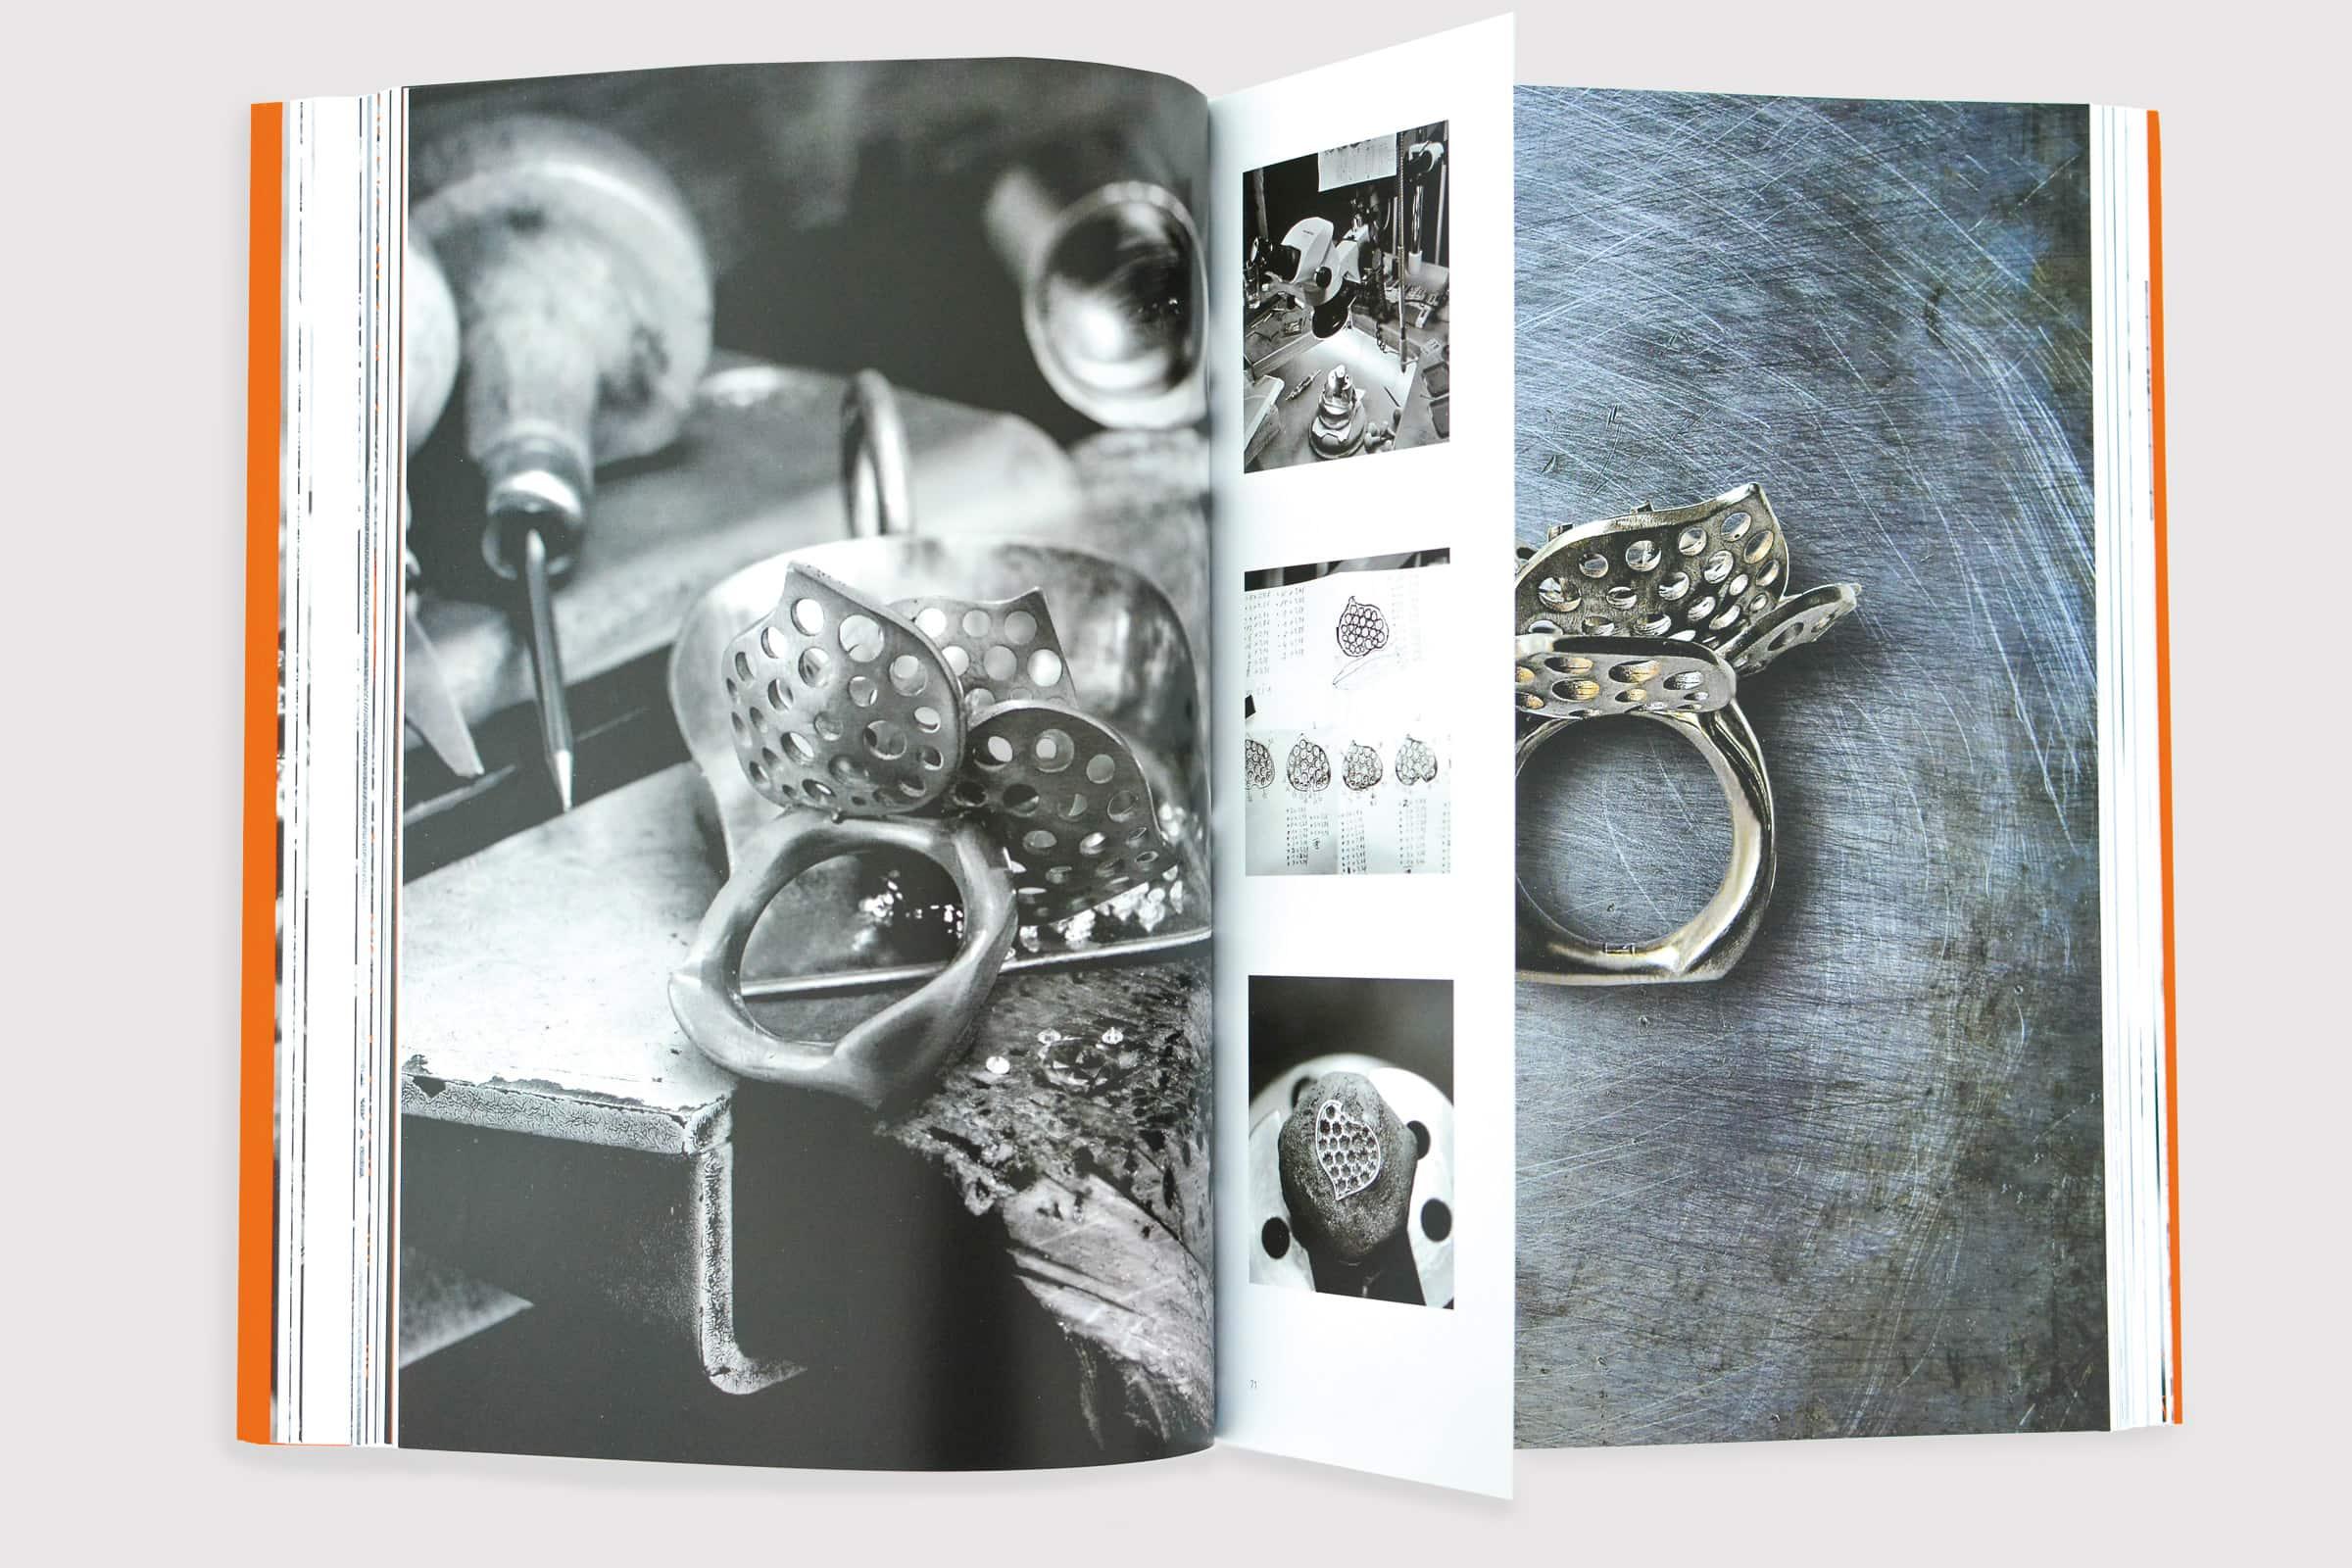 Johannes Hundt, Schmuckmanufaktur, Katalog, Design, Editorial Design